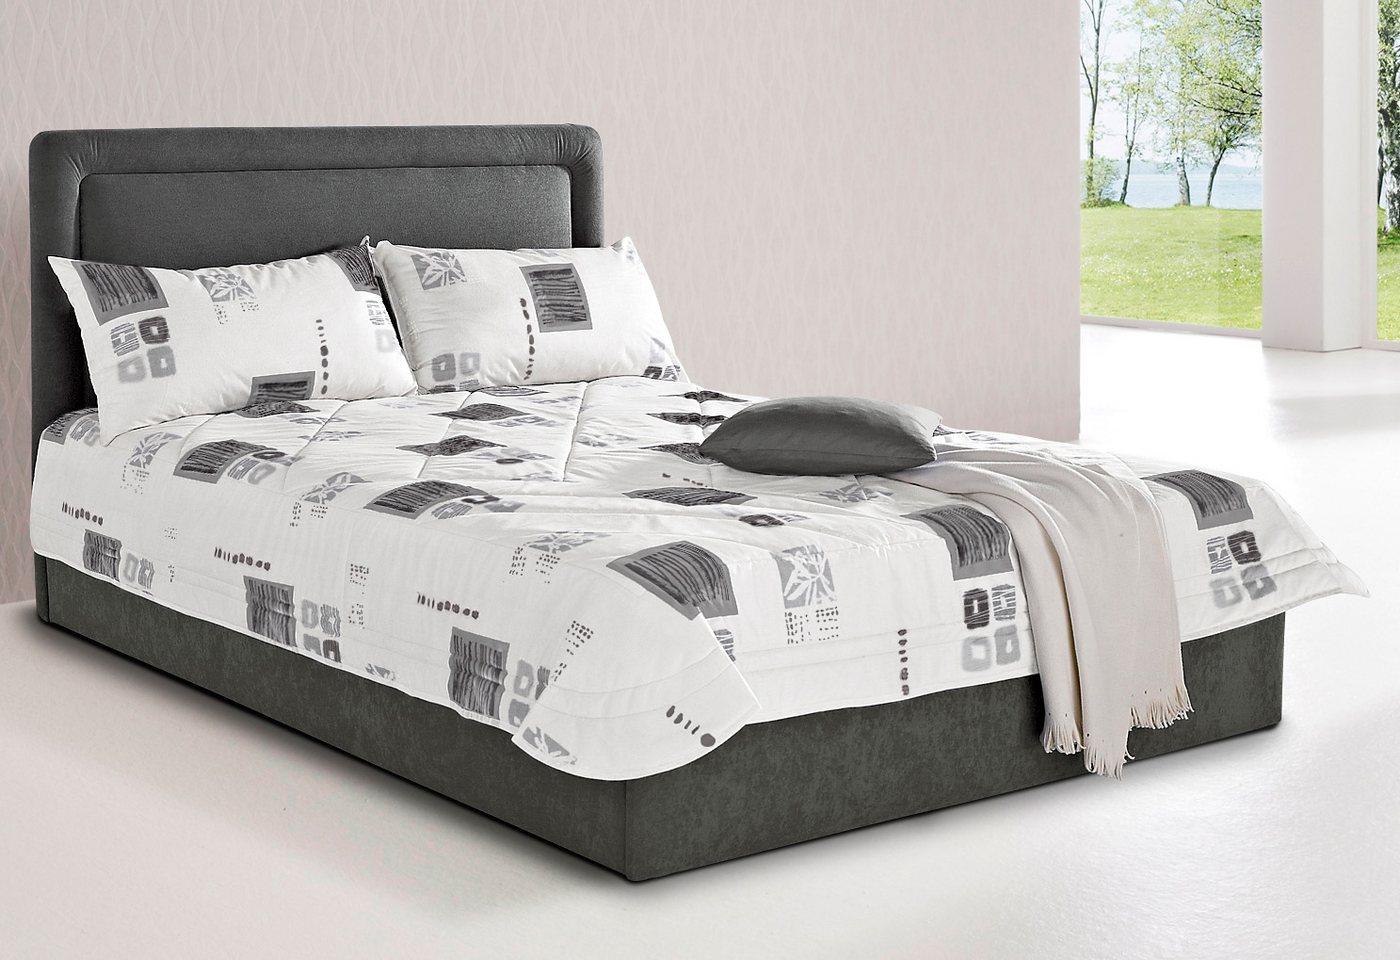 Westfalia Schlafkomfort Polsterbett, wahlweise mit Bettkasten | Schlafzimmer > Betten > Polsterbetten | Grau | Westfalia Schlafkomfort